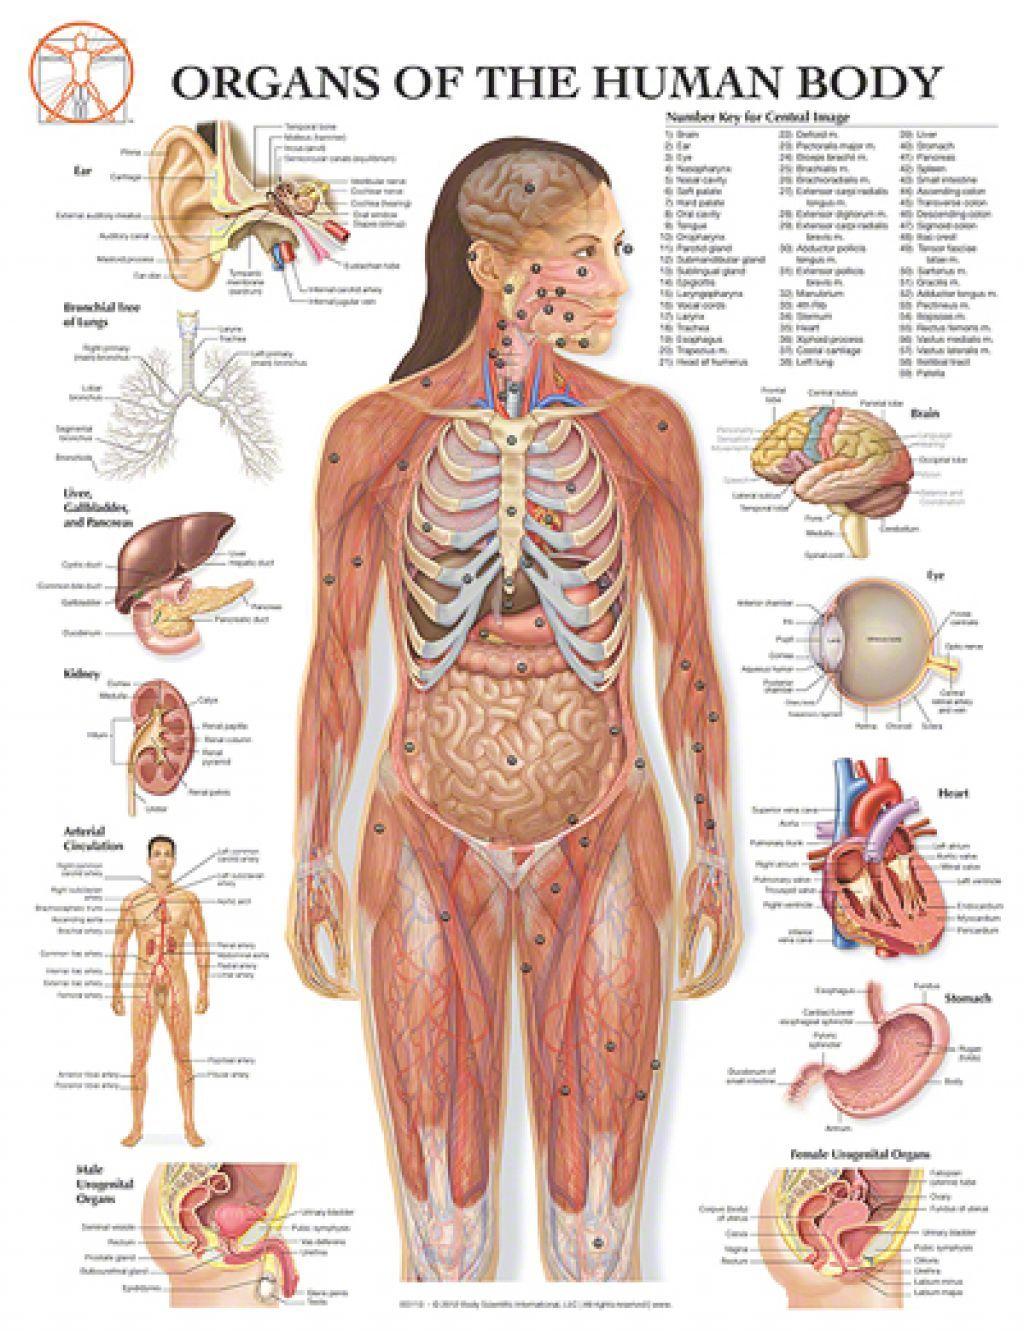 female human body diagram of organs projects to try human body human body diagram female body organs diagram female [ 1024 x 1331 Pixel ]